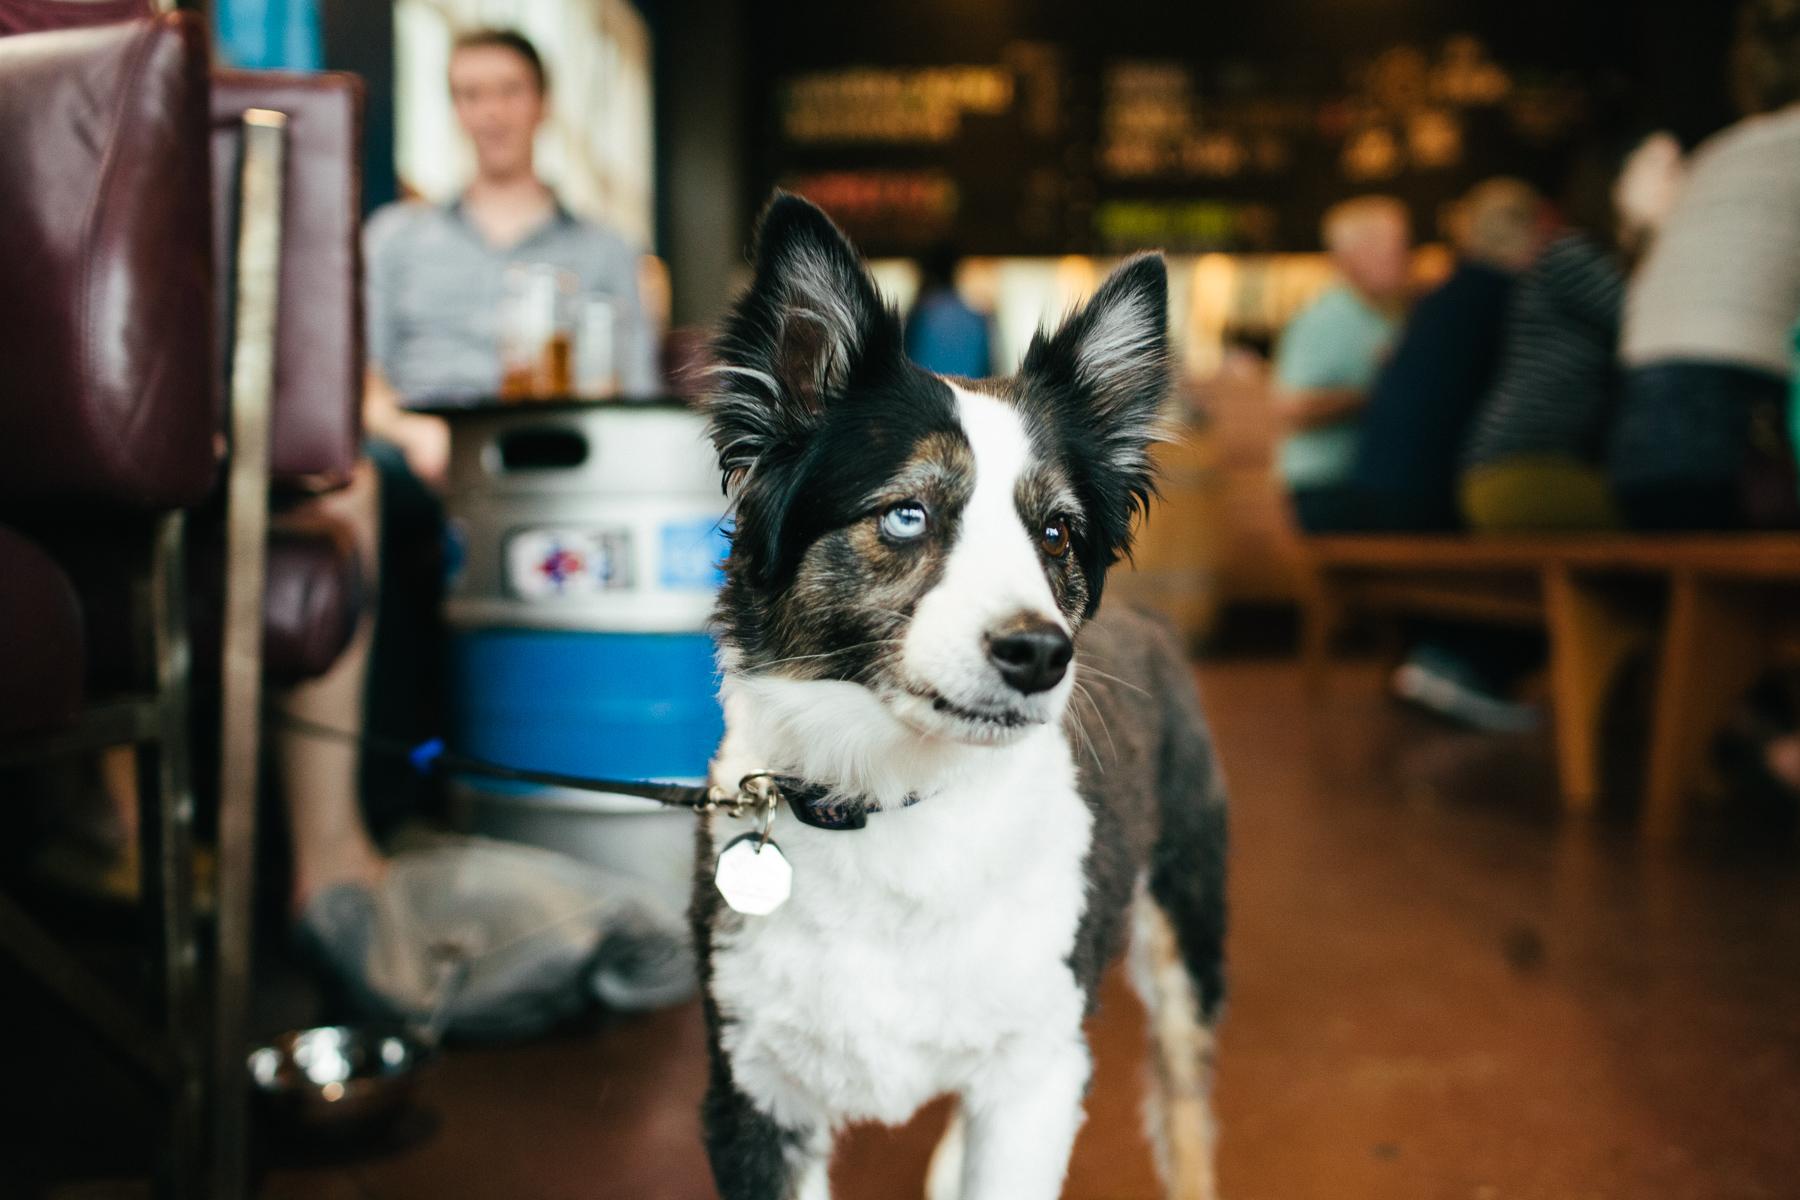 U.B.G. customer's dog